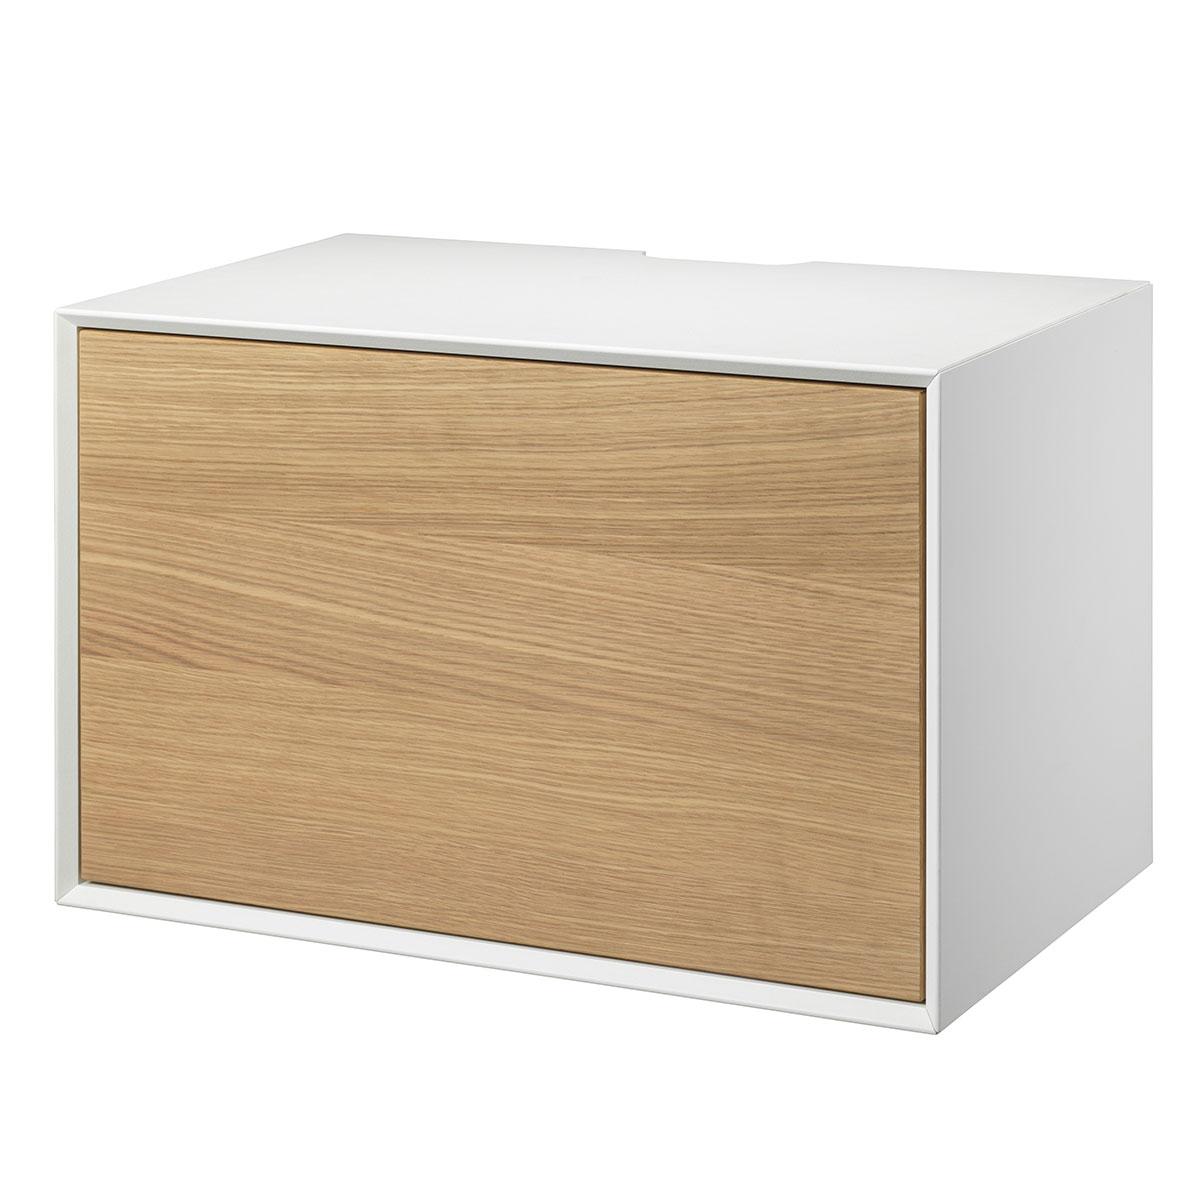 Image of   Living&more hi-fi skab - The Box - 37 x 58 x 34 cm - Hvid/eg